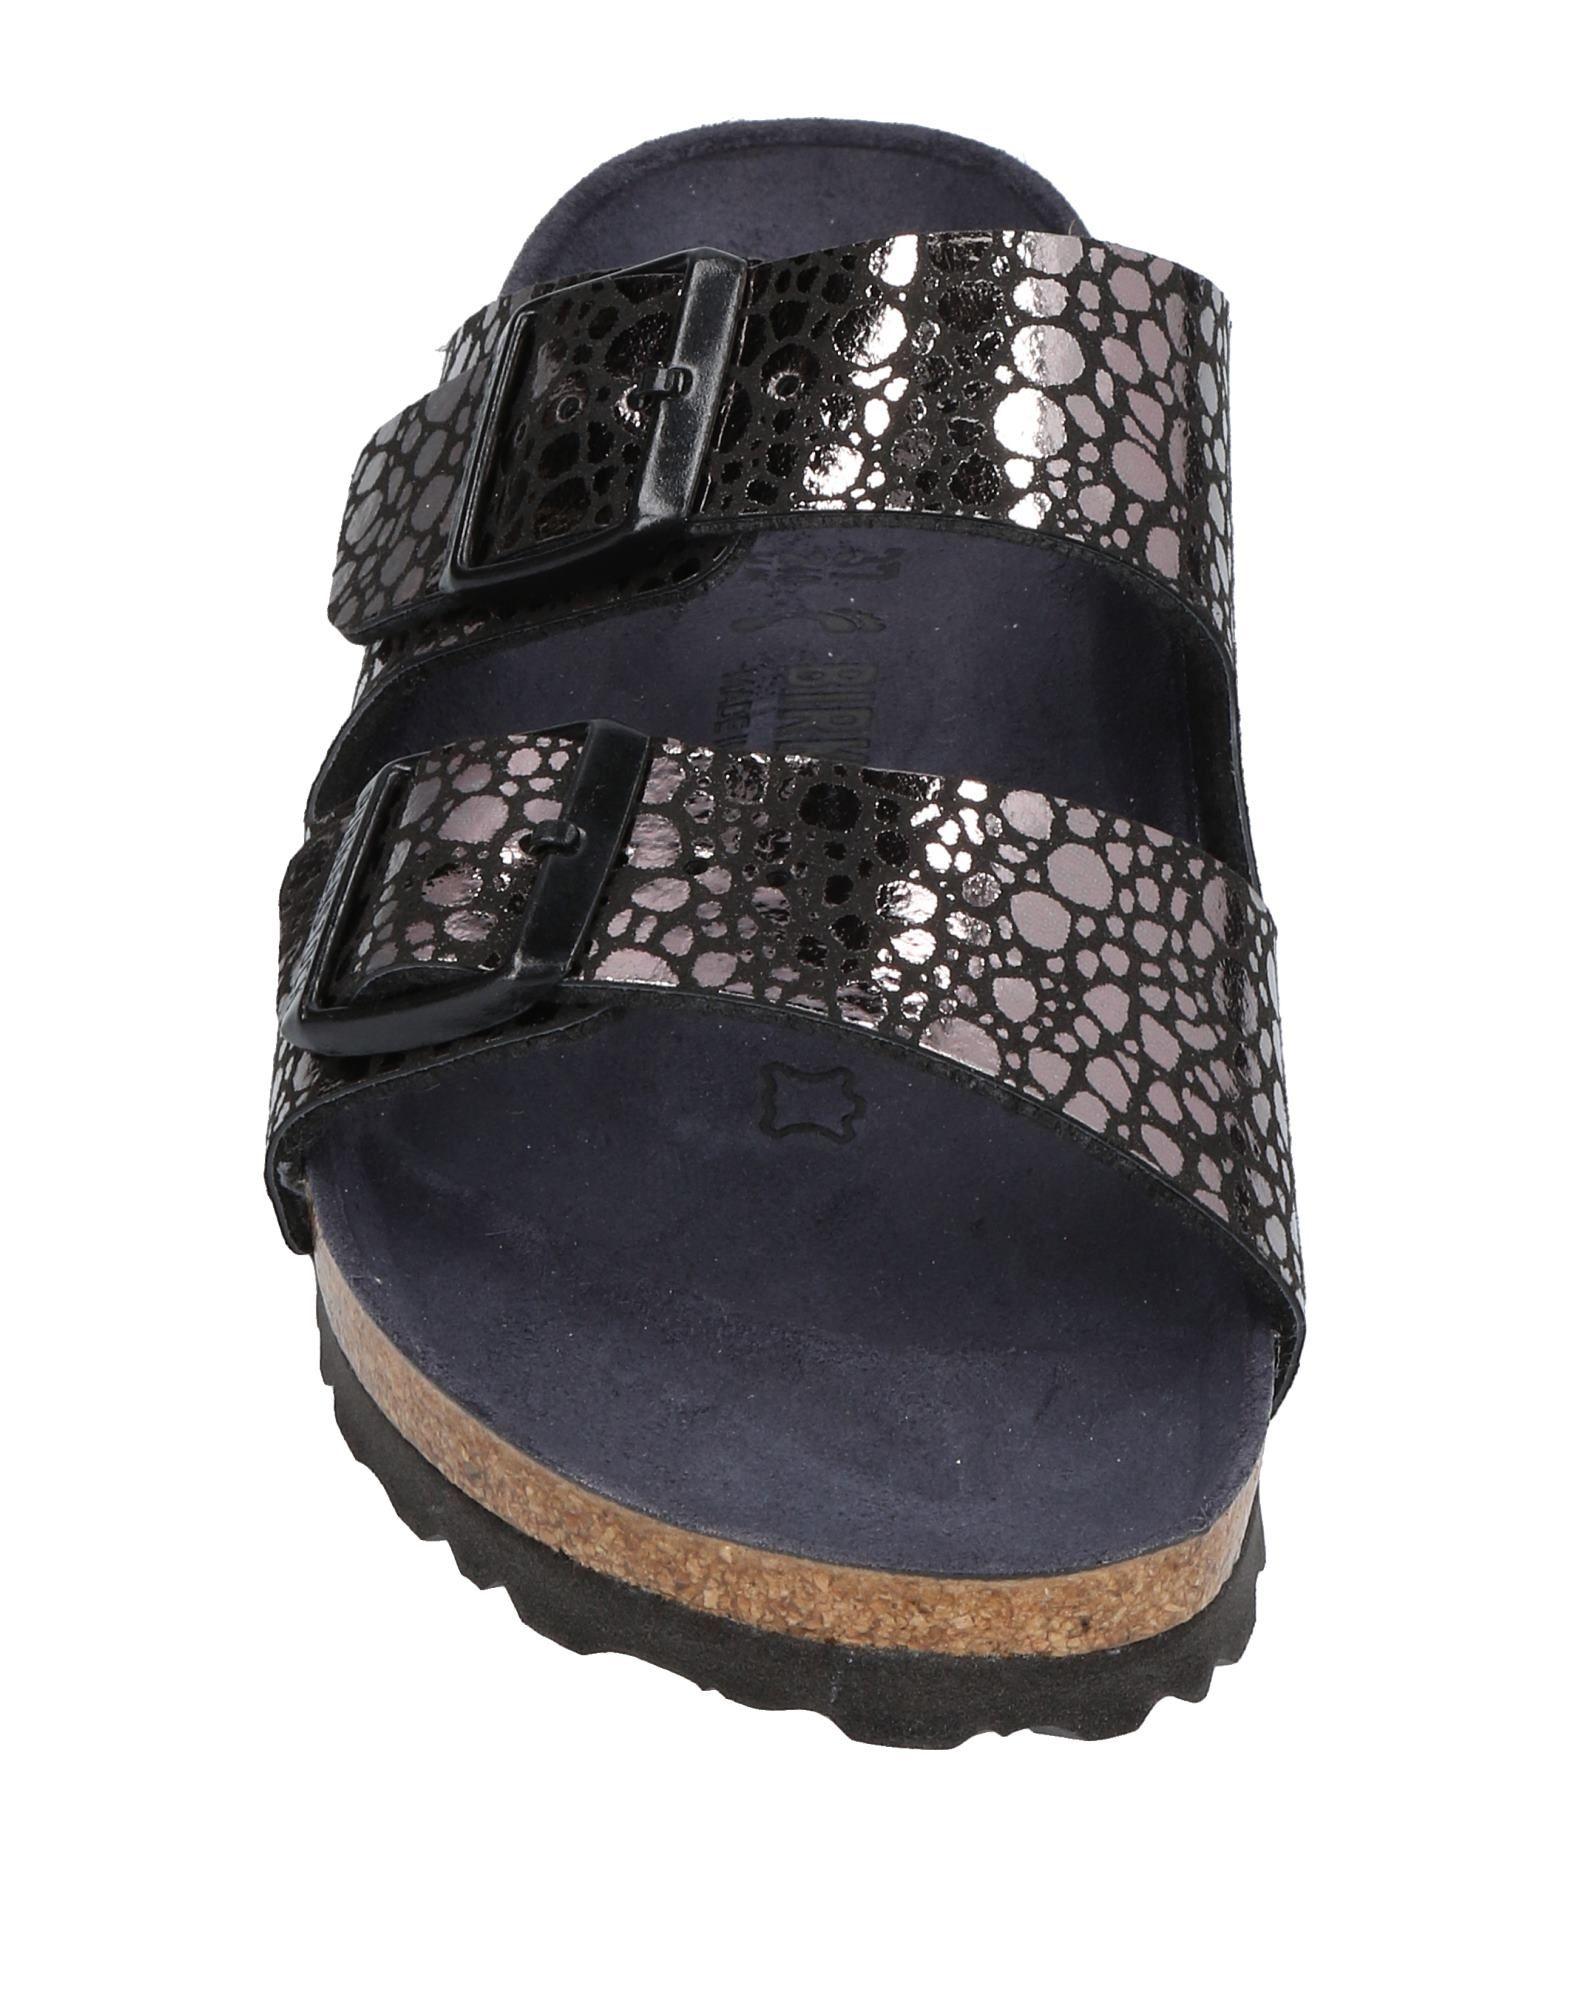 Birkenstock Sandalen Damen  11444392IJ Gute Qualität beliebte Schuhe